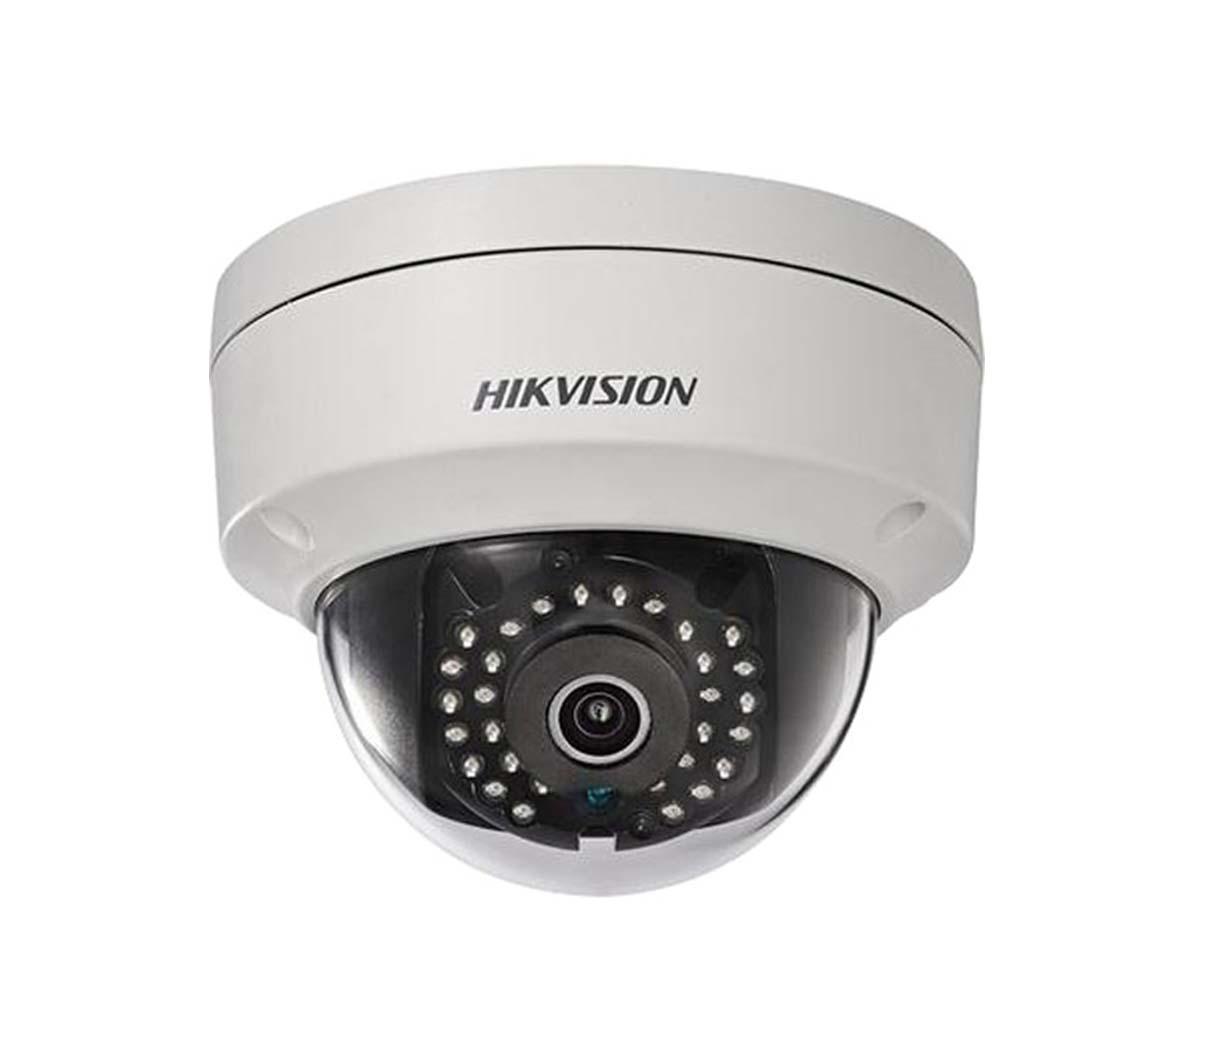 HIKVISION IPC DS-2CD1043G0-I 4.0MP H.265+ POE